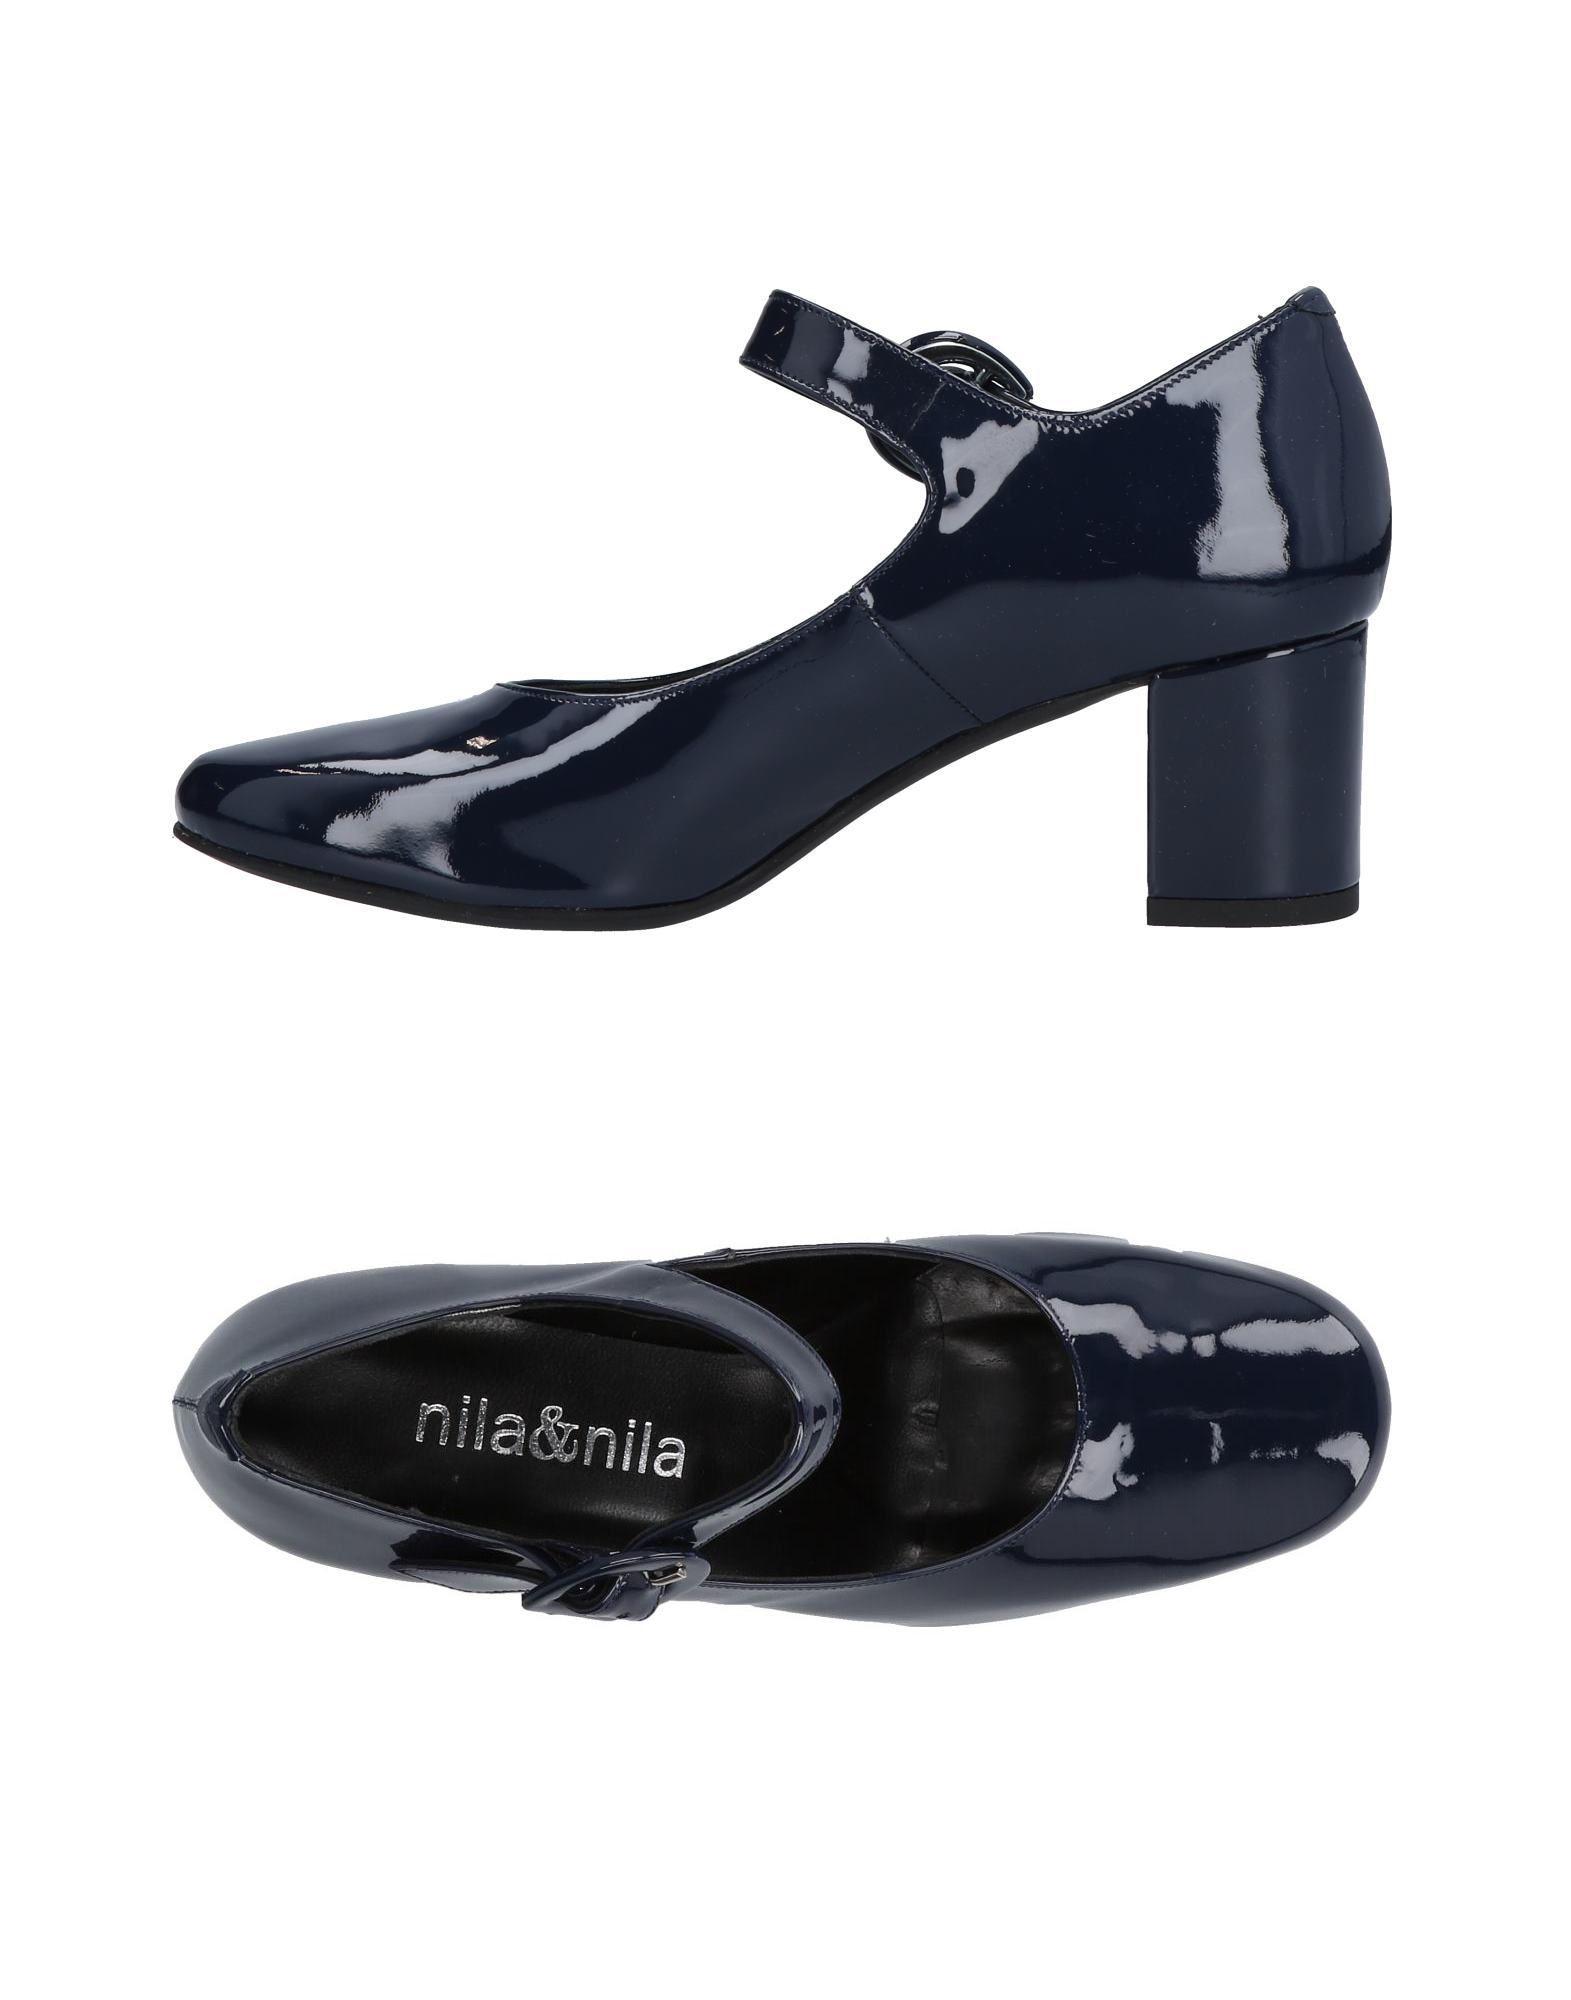 Décolleté Nila & Nila Donna - Acquista online su